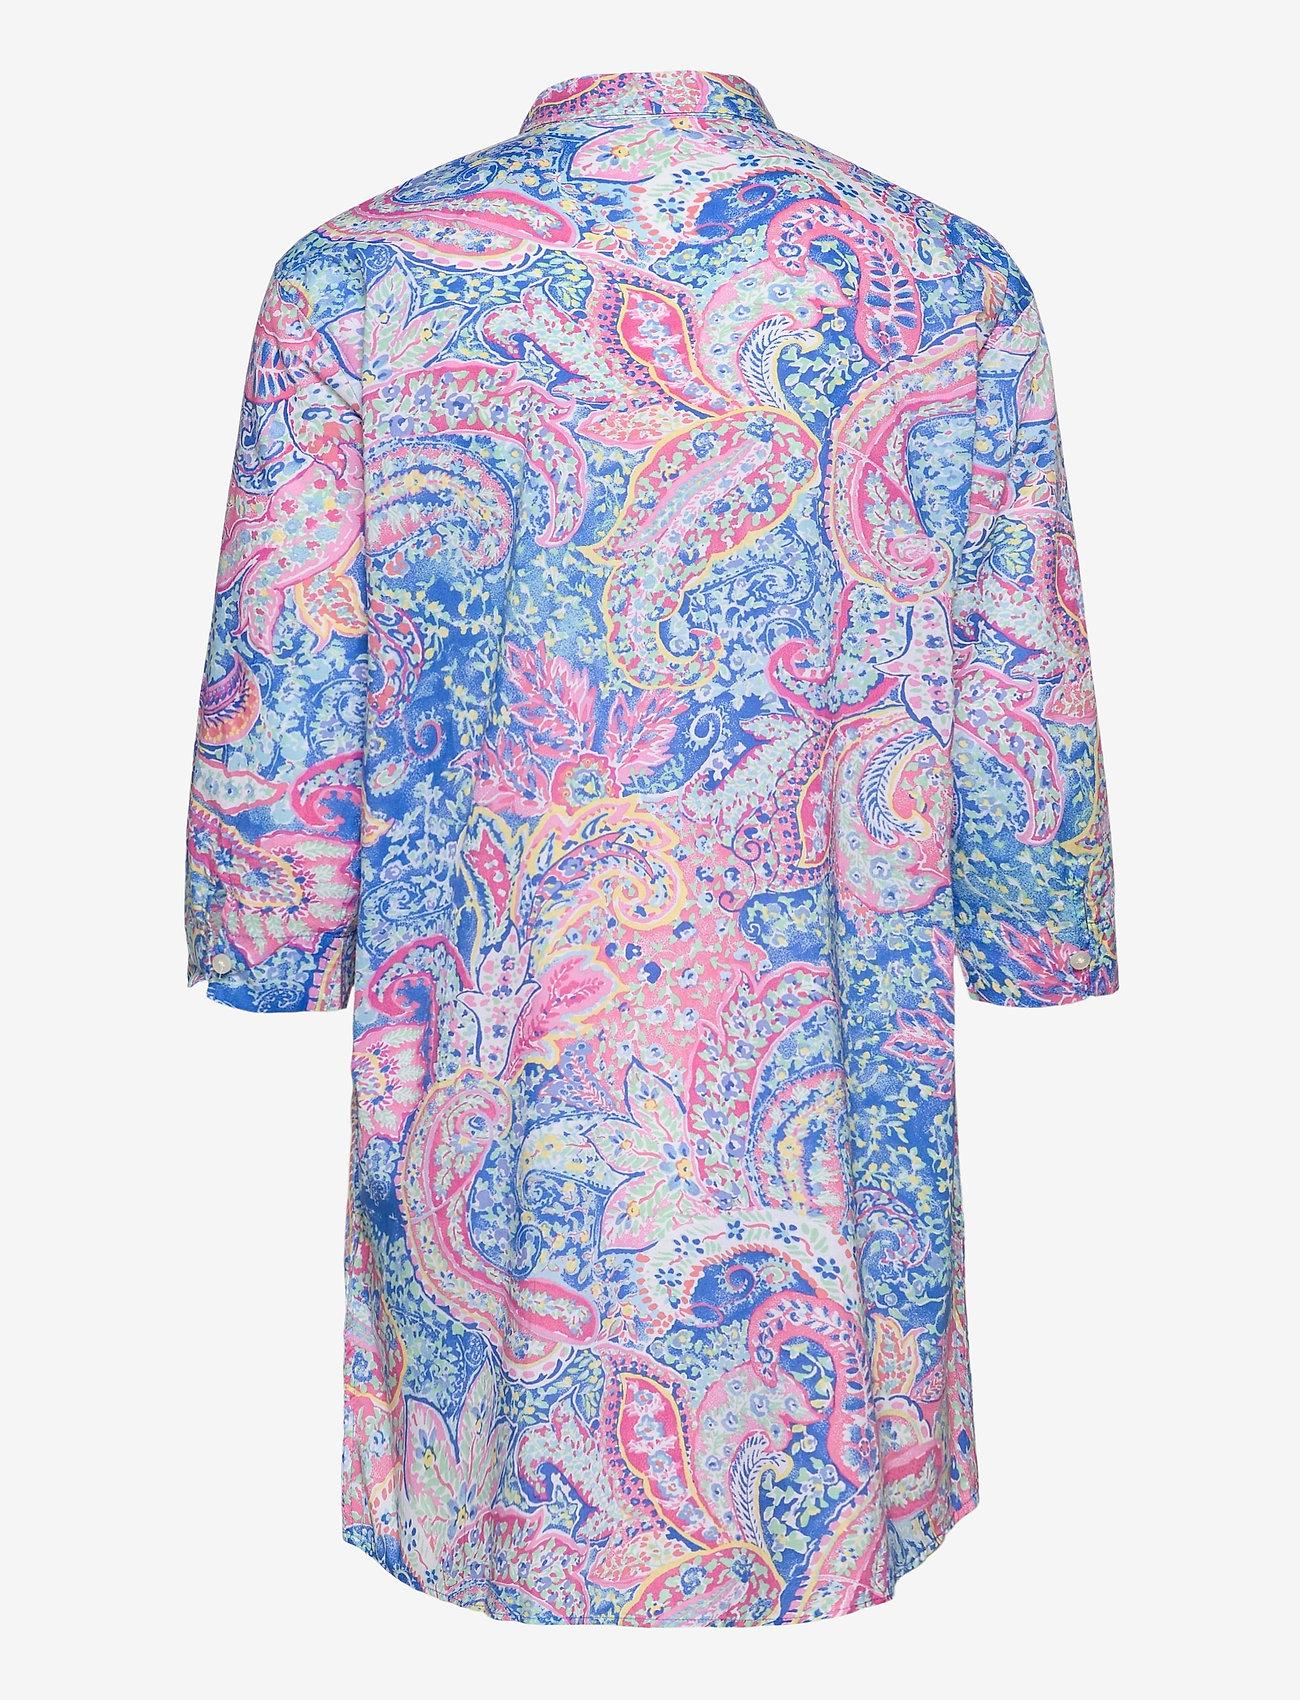 Lauren Ralph Lauren Homewear - LRL ROLL TAB HIS SLEEPSHIRT - natkjoler - multi paisley - 1